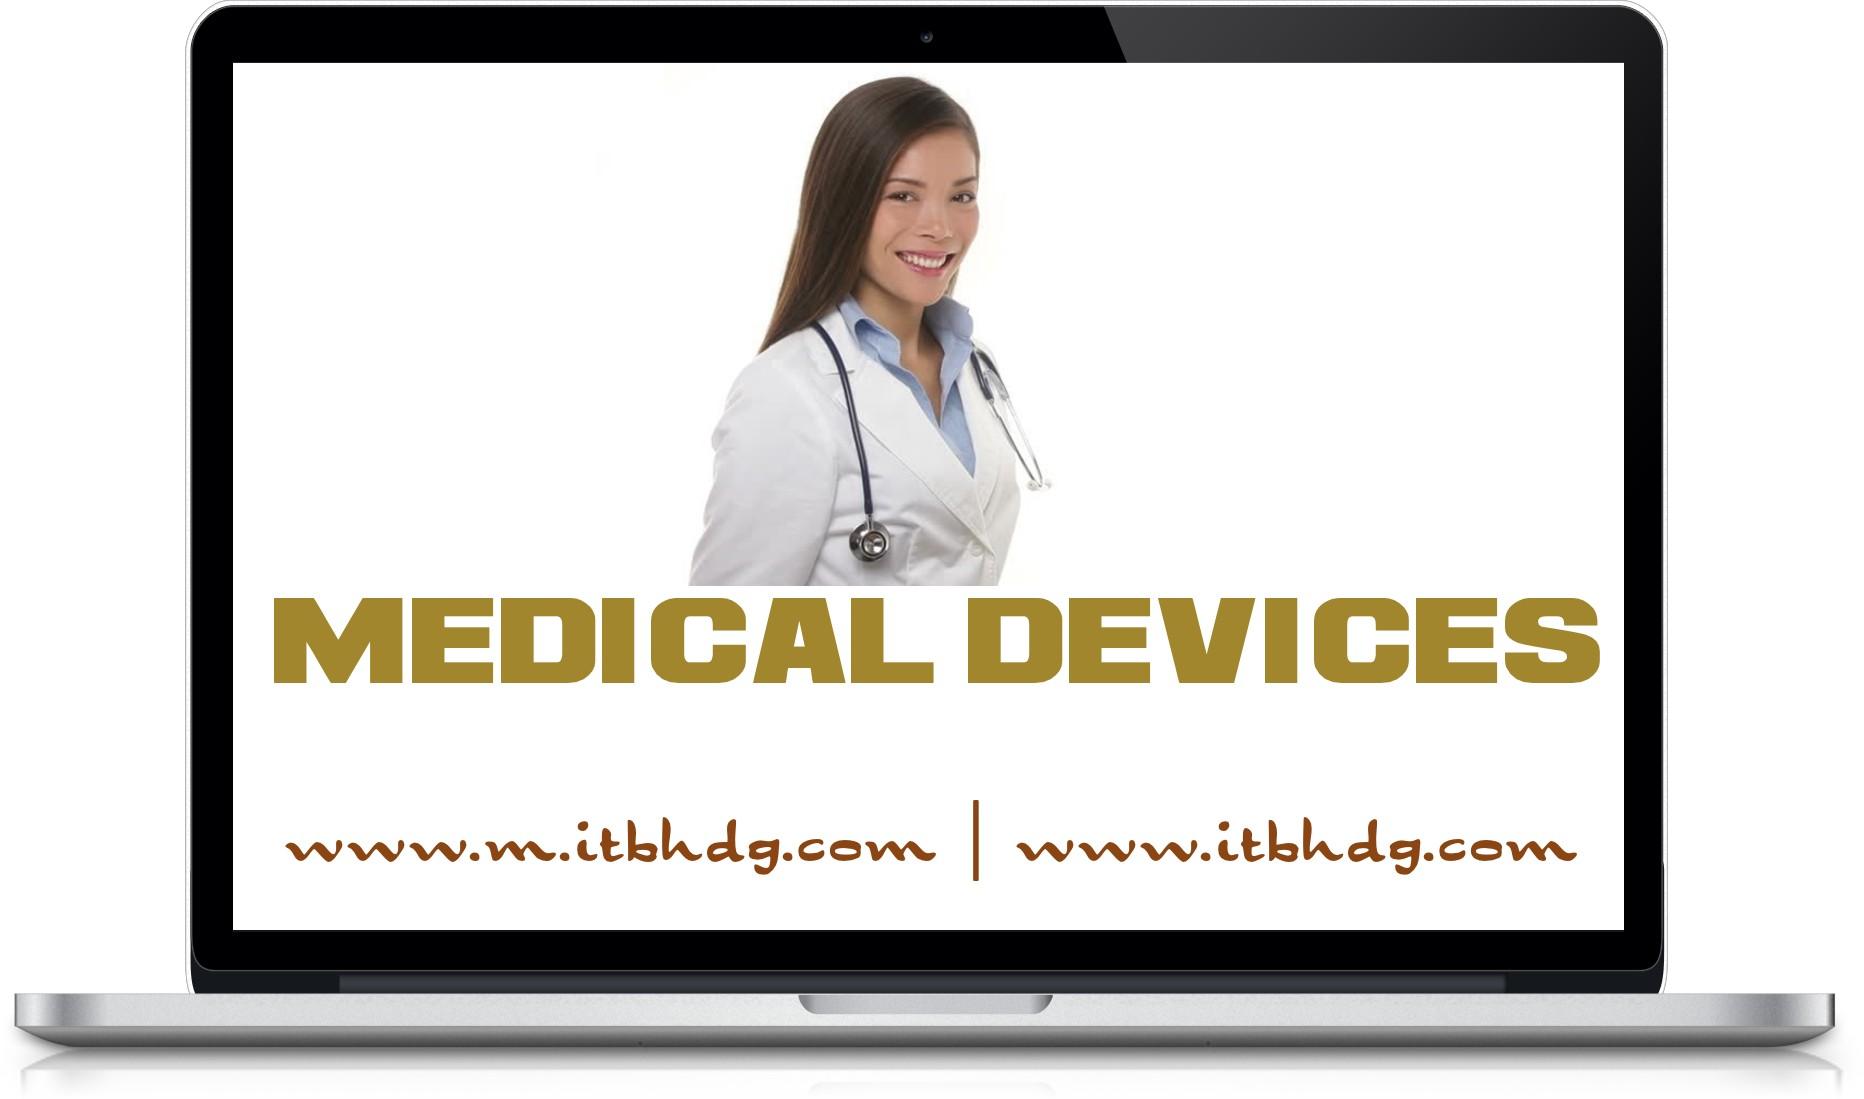 FDA Establishment Registration, Medical Devices Listing